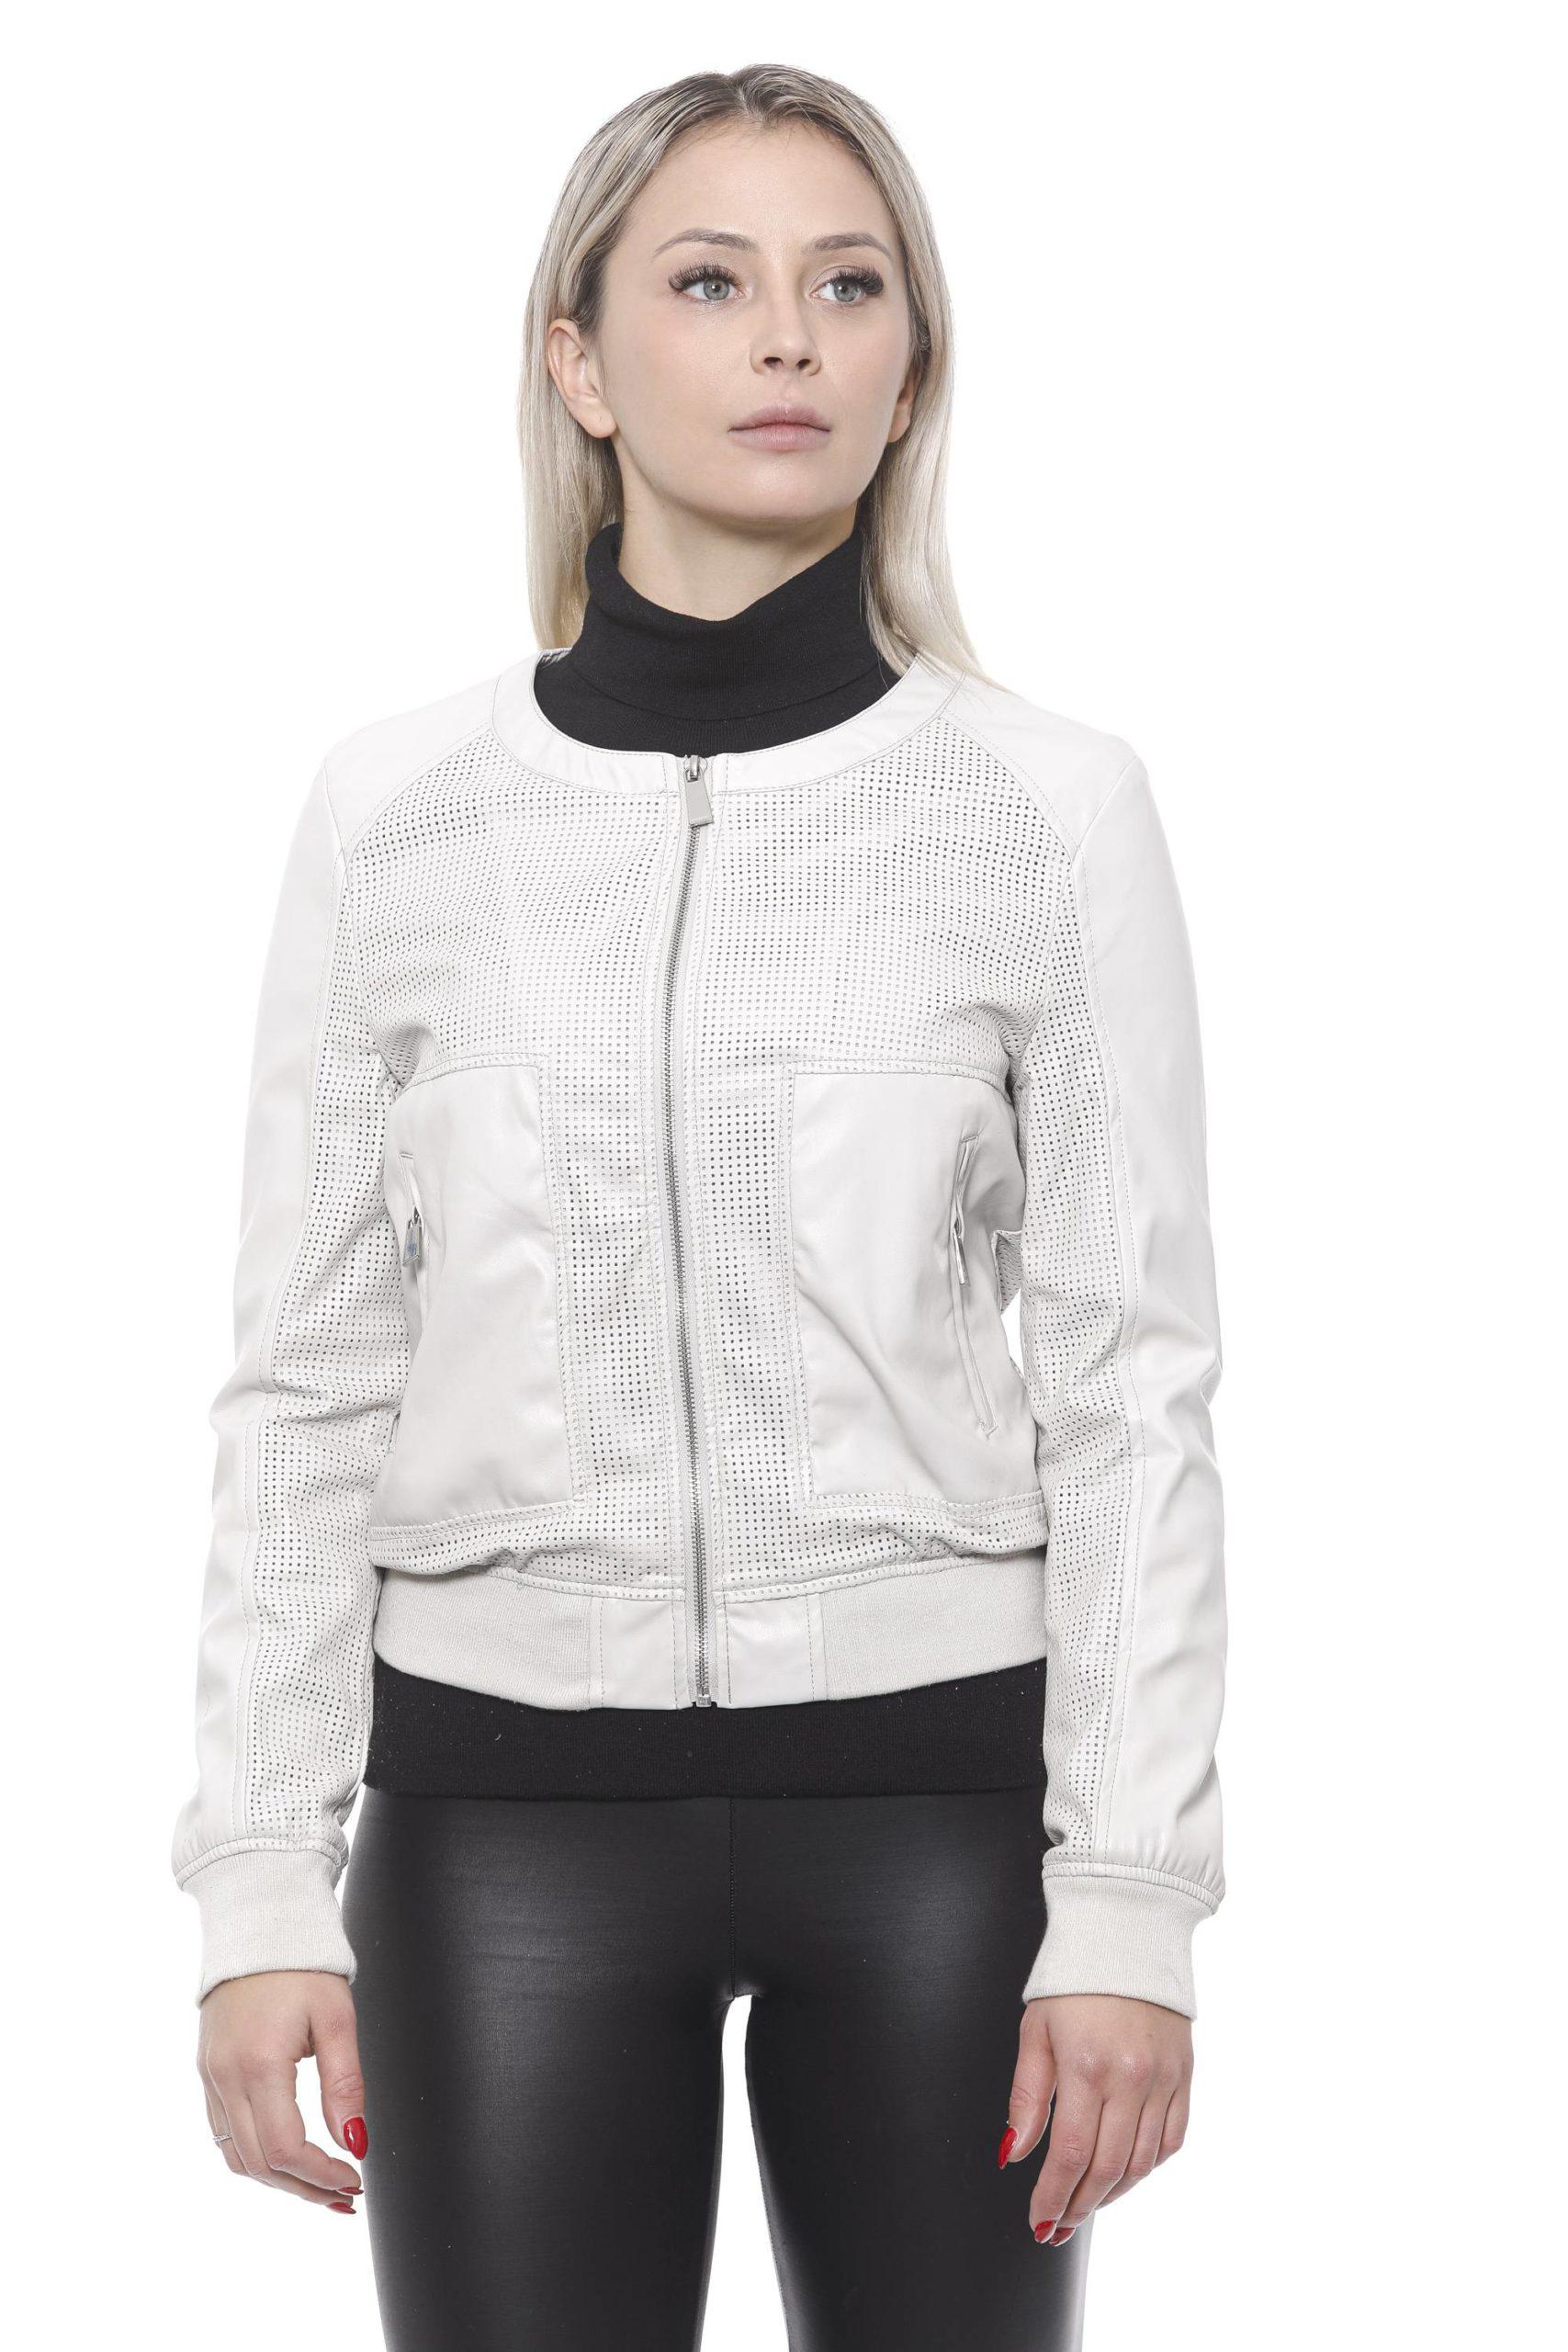 19V69 Italia Women's Jacket Beige 191388228 - M